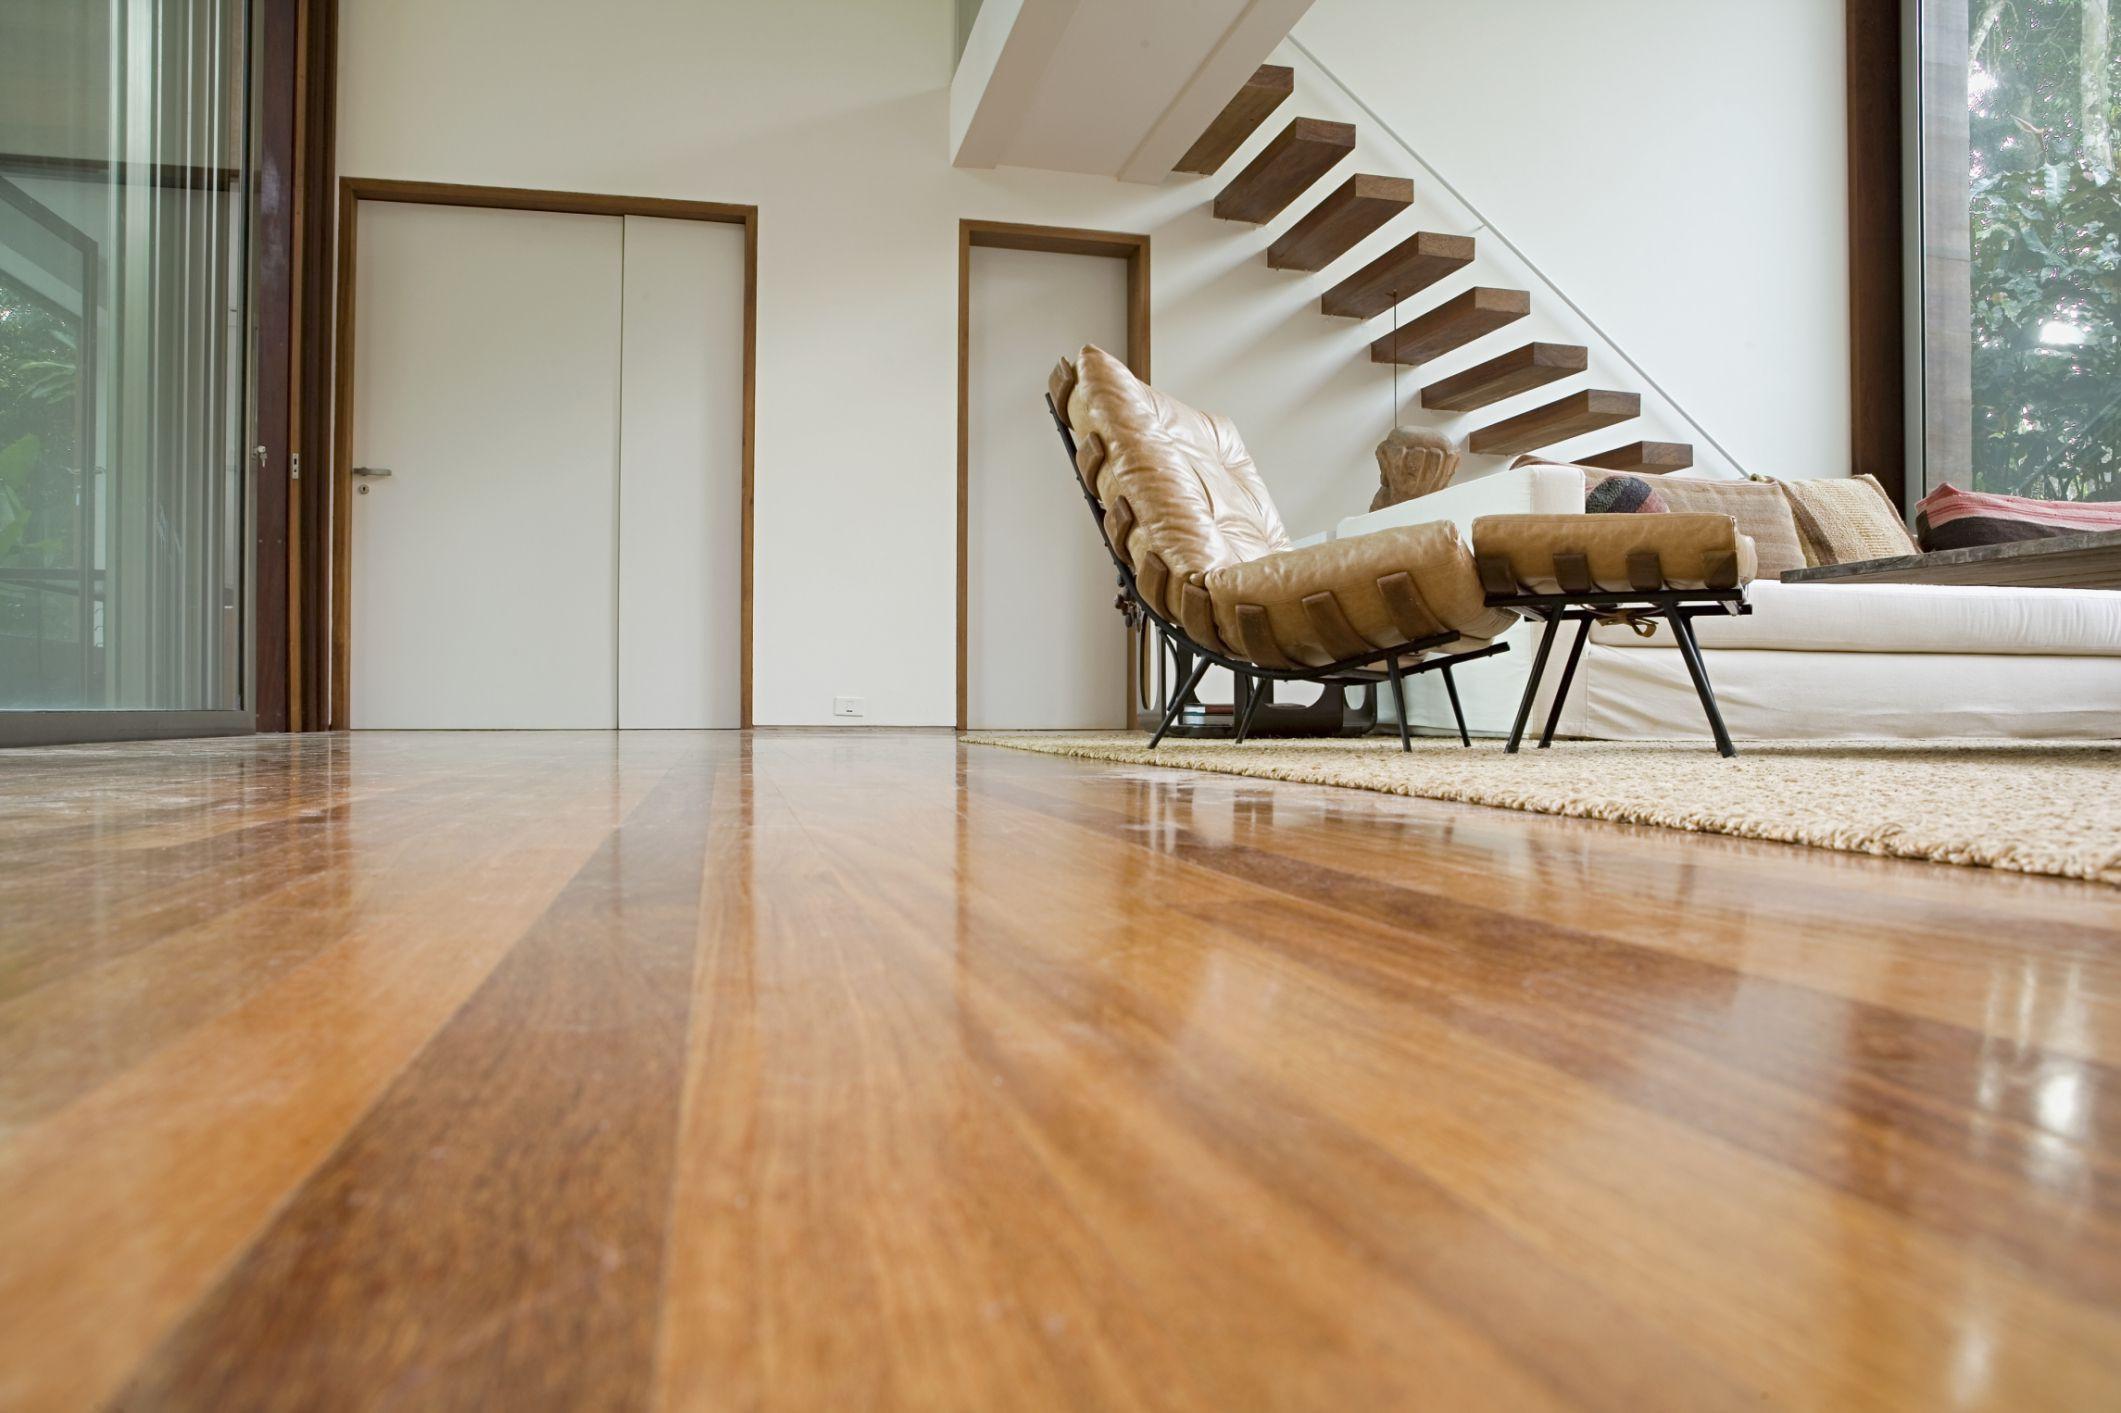 maple hardwood flooring cost of engineered wood flooring vs solid wood flooring within 200571260 001 highres 56a49dec5f9b58b7d0d7dc1e